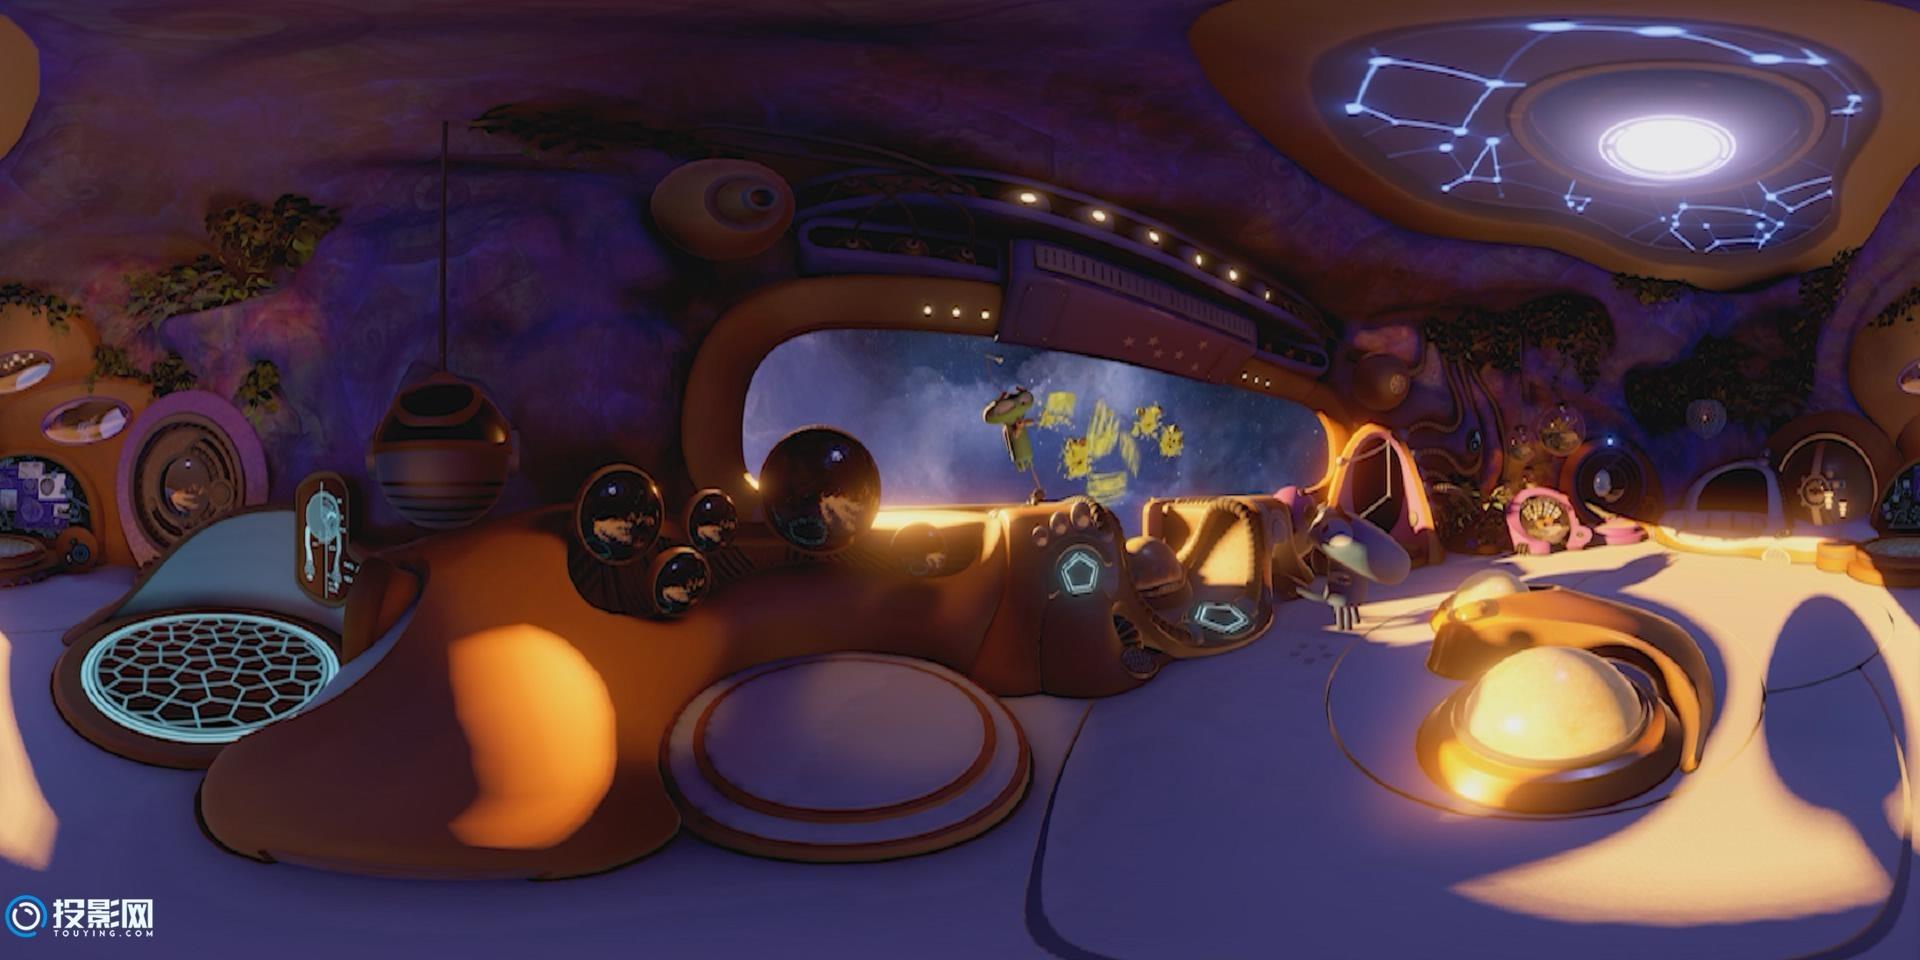 [VR360°全景] 动画短片 《ASTEROIDS!》 全篇 [1080P/MP4/346MB]